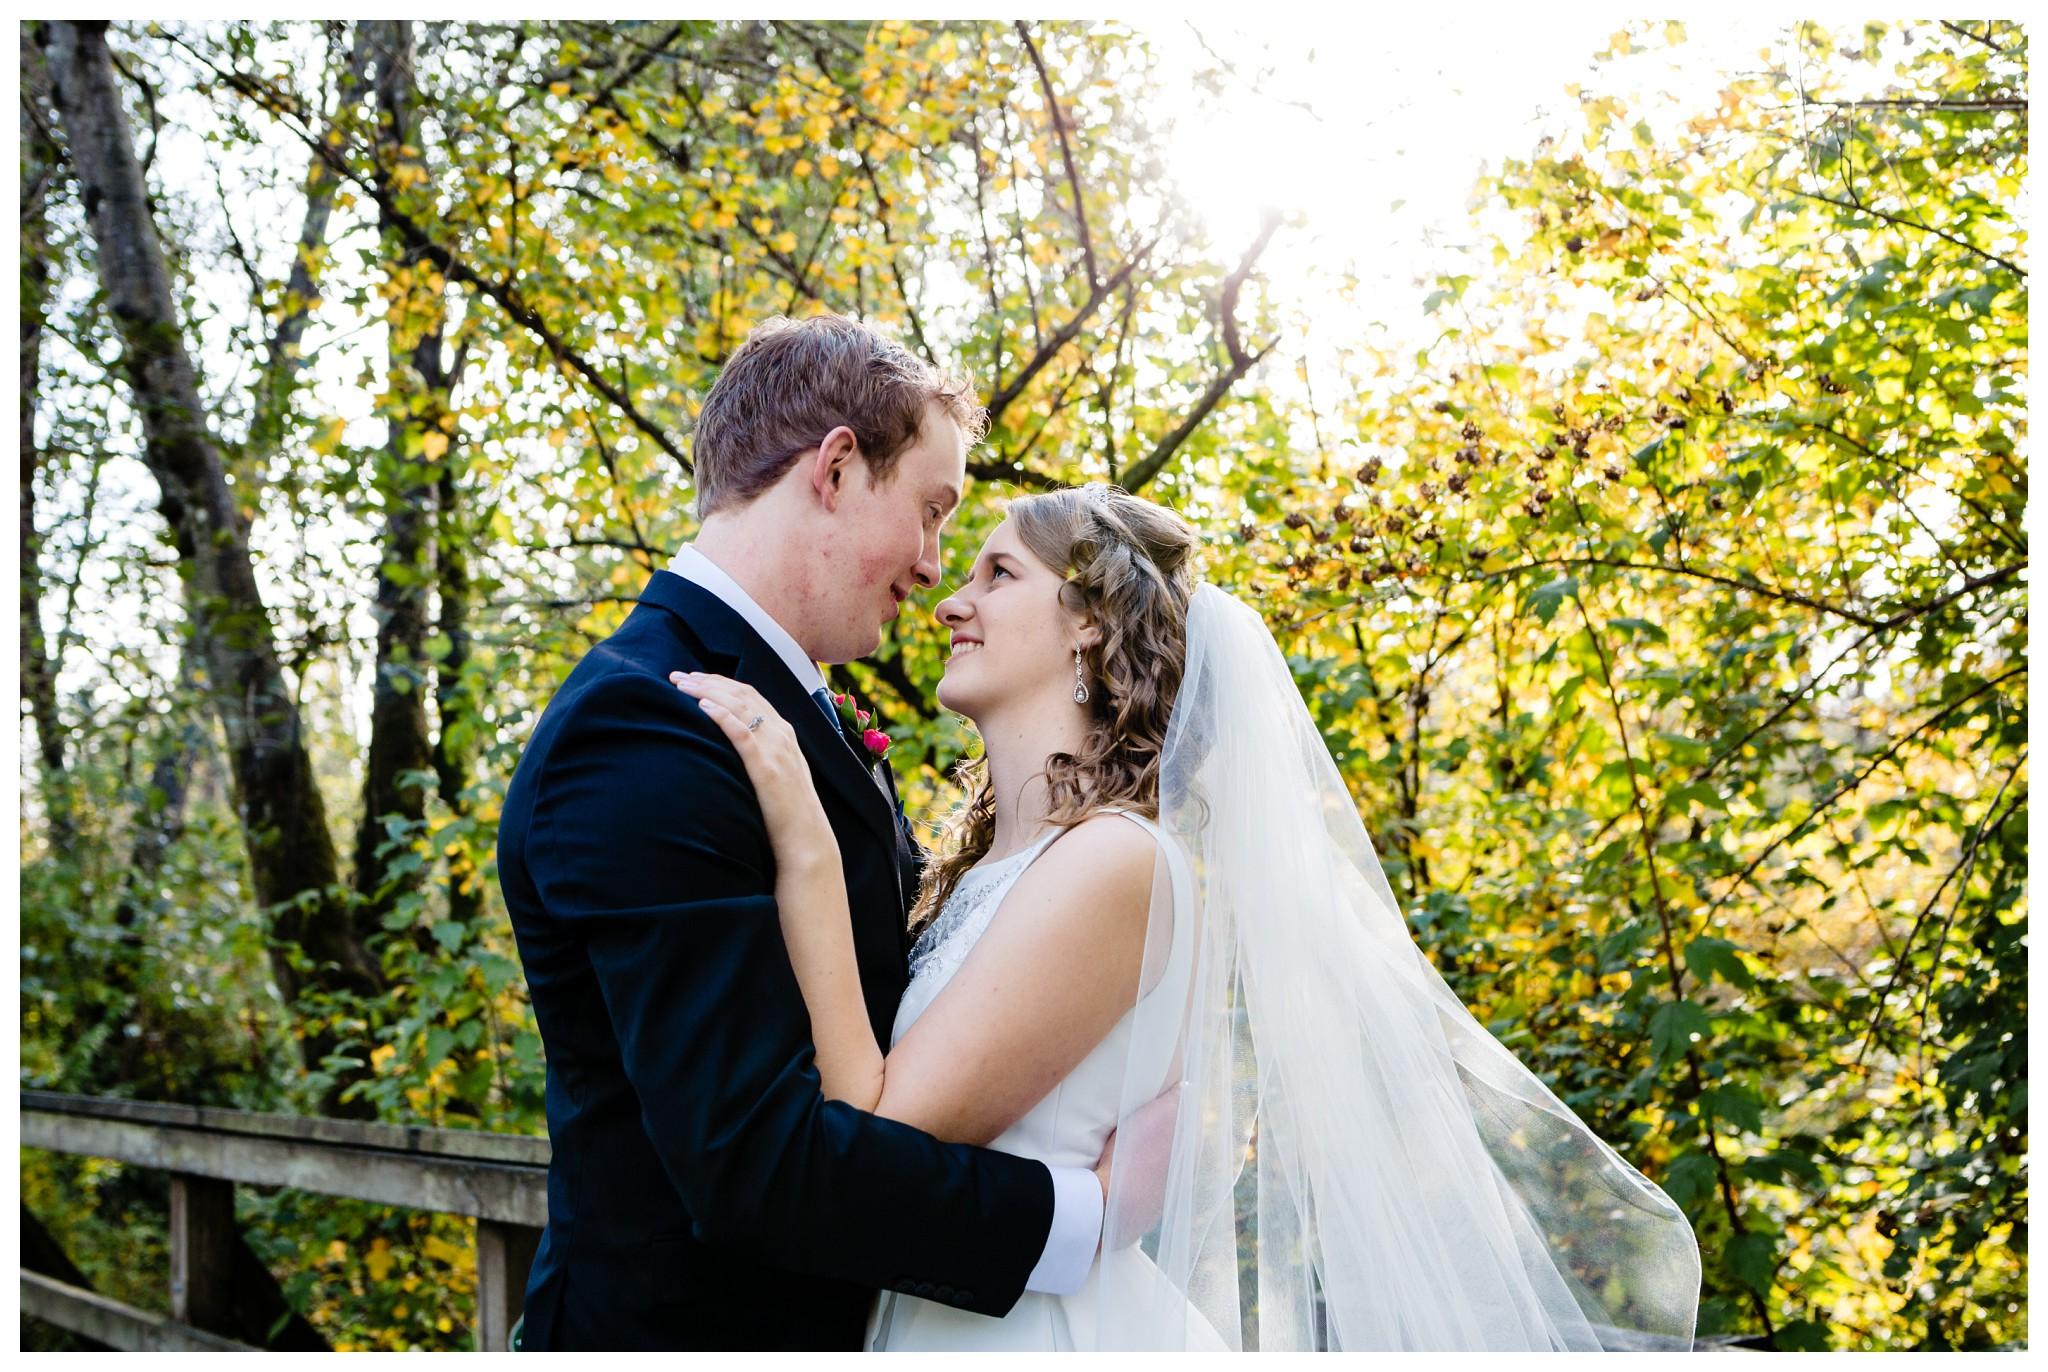 Aldergrove Park Christian Church Wedding Photography Pink Flowers Blue Bridesmaid Dress Fall_0103.jpg